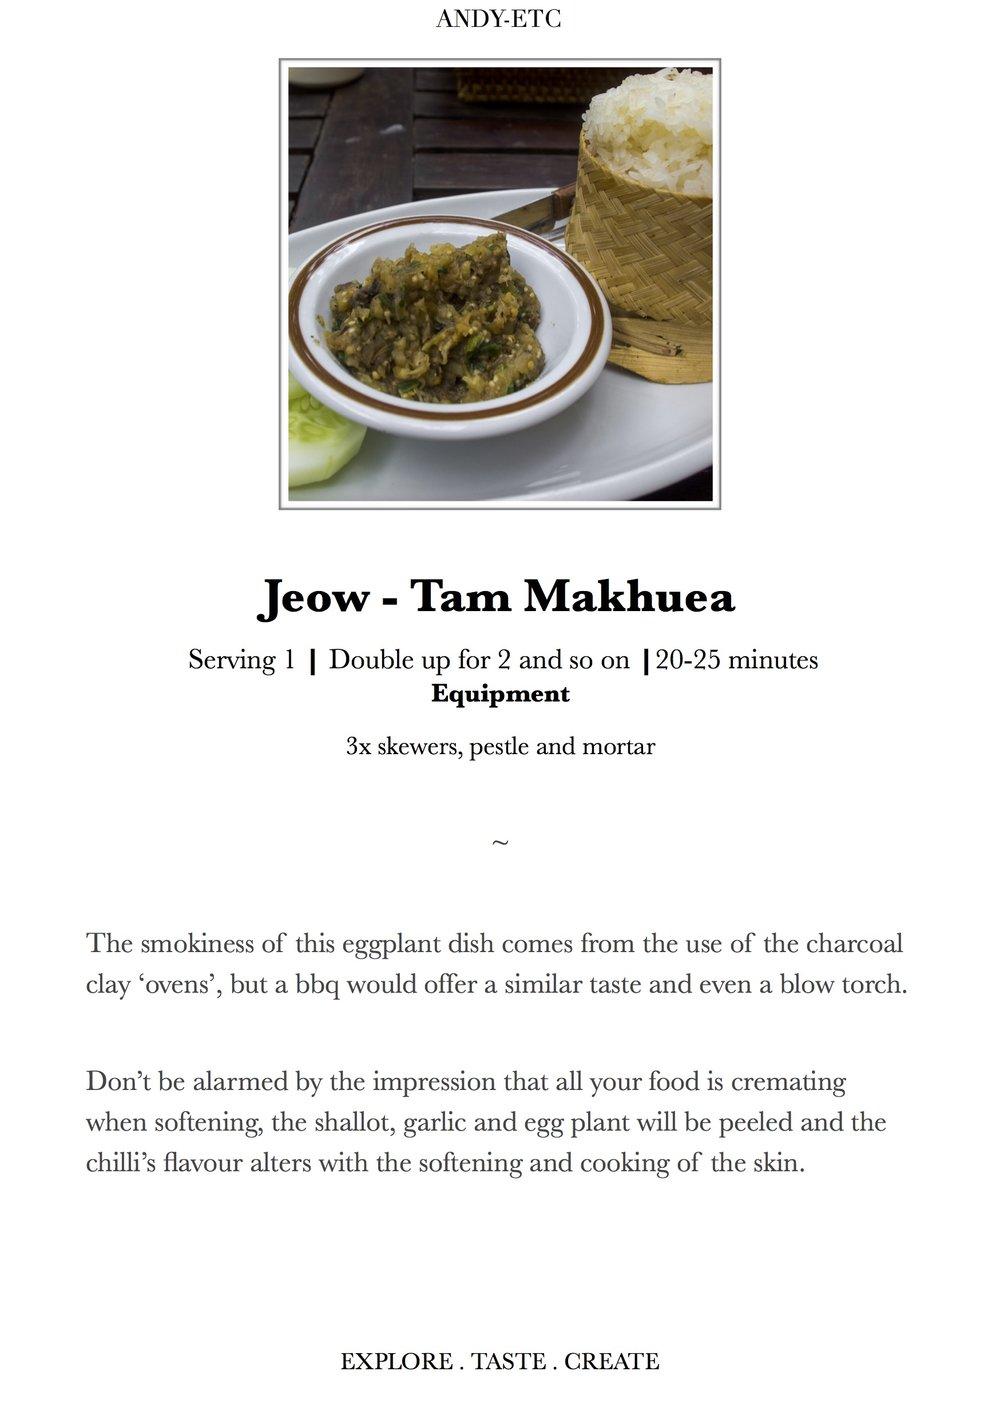 Jeow recipe.jpg